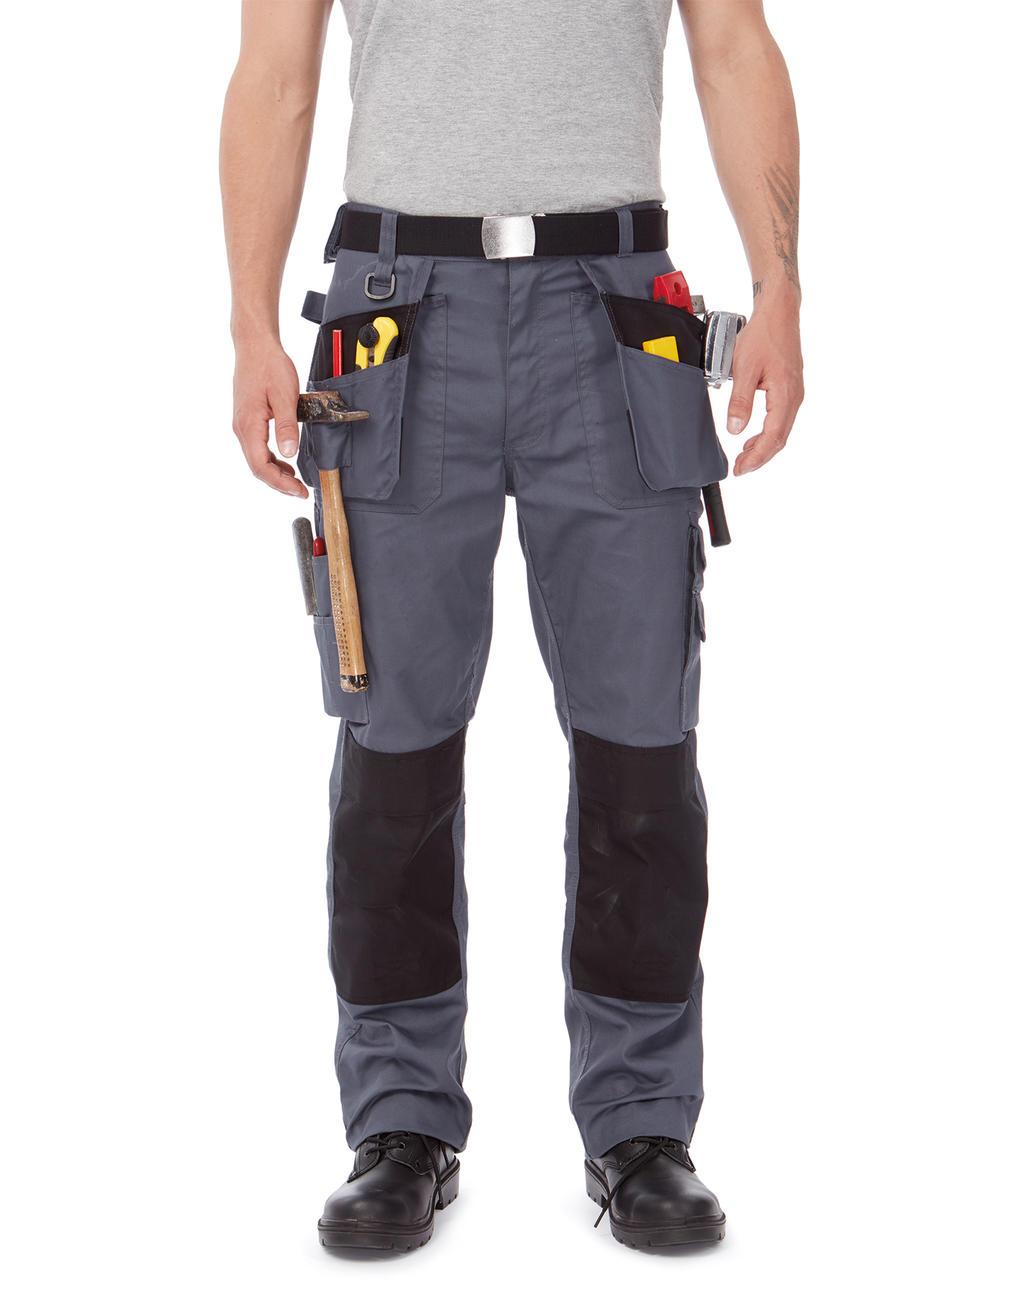 Spodnie robocze Advanced